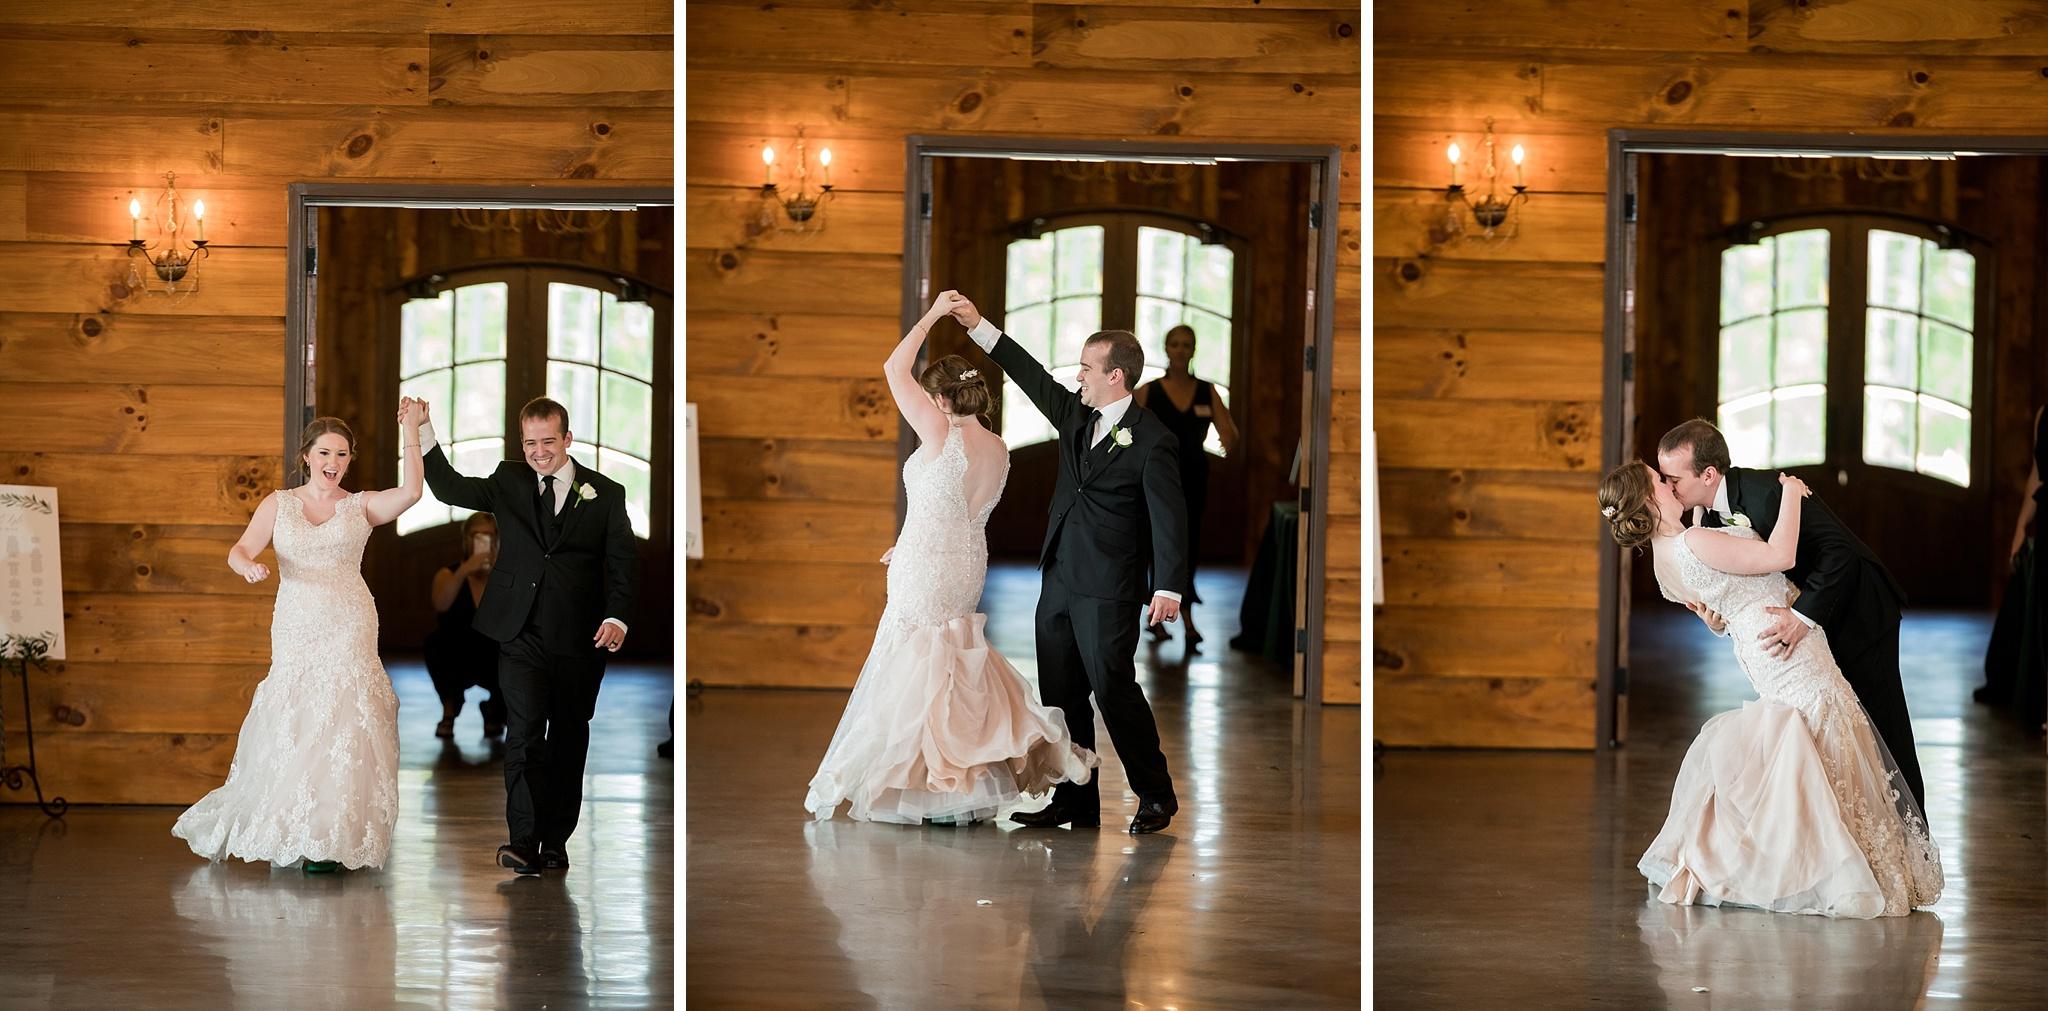 Pavilion-Carriage-Farms-Wedding-Photographer-216.jpg